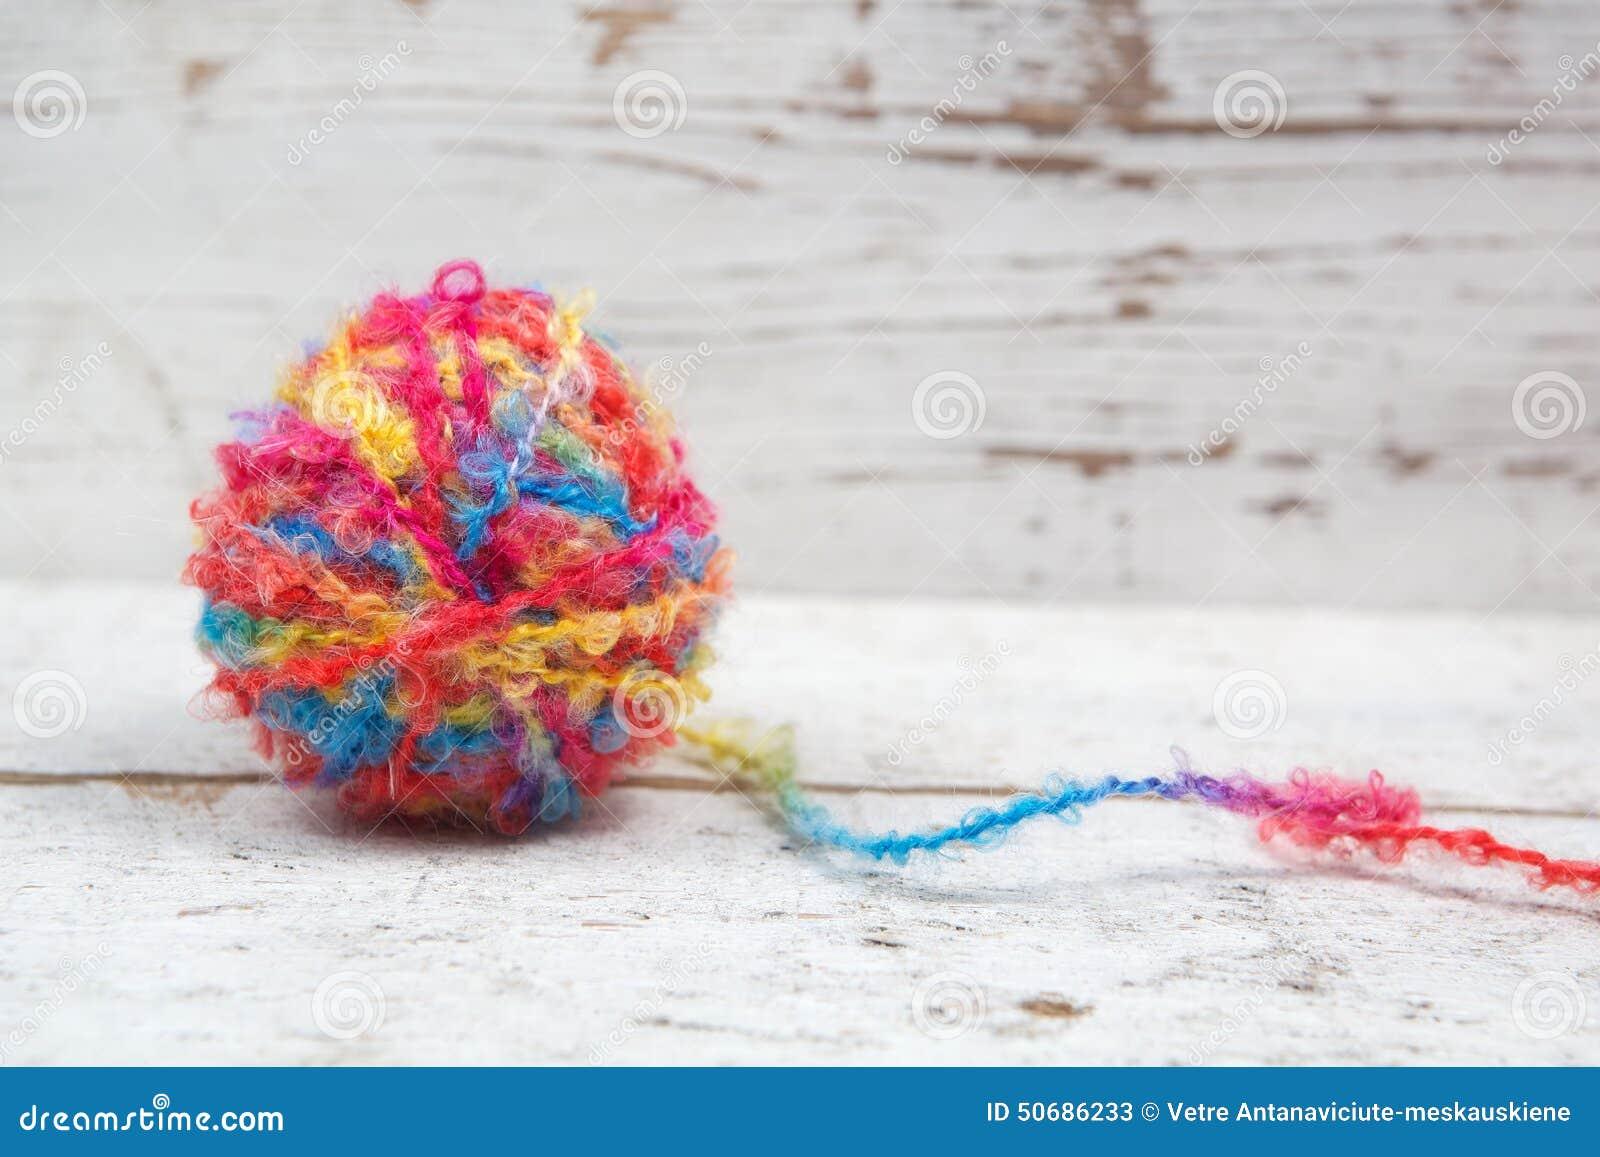 Download 毛线鸡蛋在木头的 库存图片. 图片 包括有 红色, 复活节, 节假日, 愉快, 颜色, 设计, 符号, 背包 - 50686233